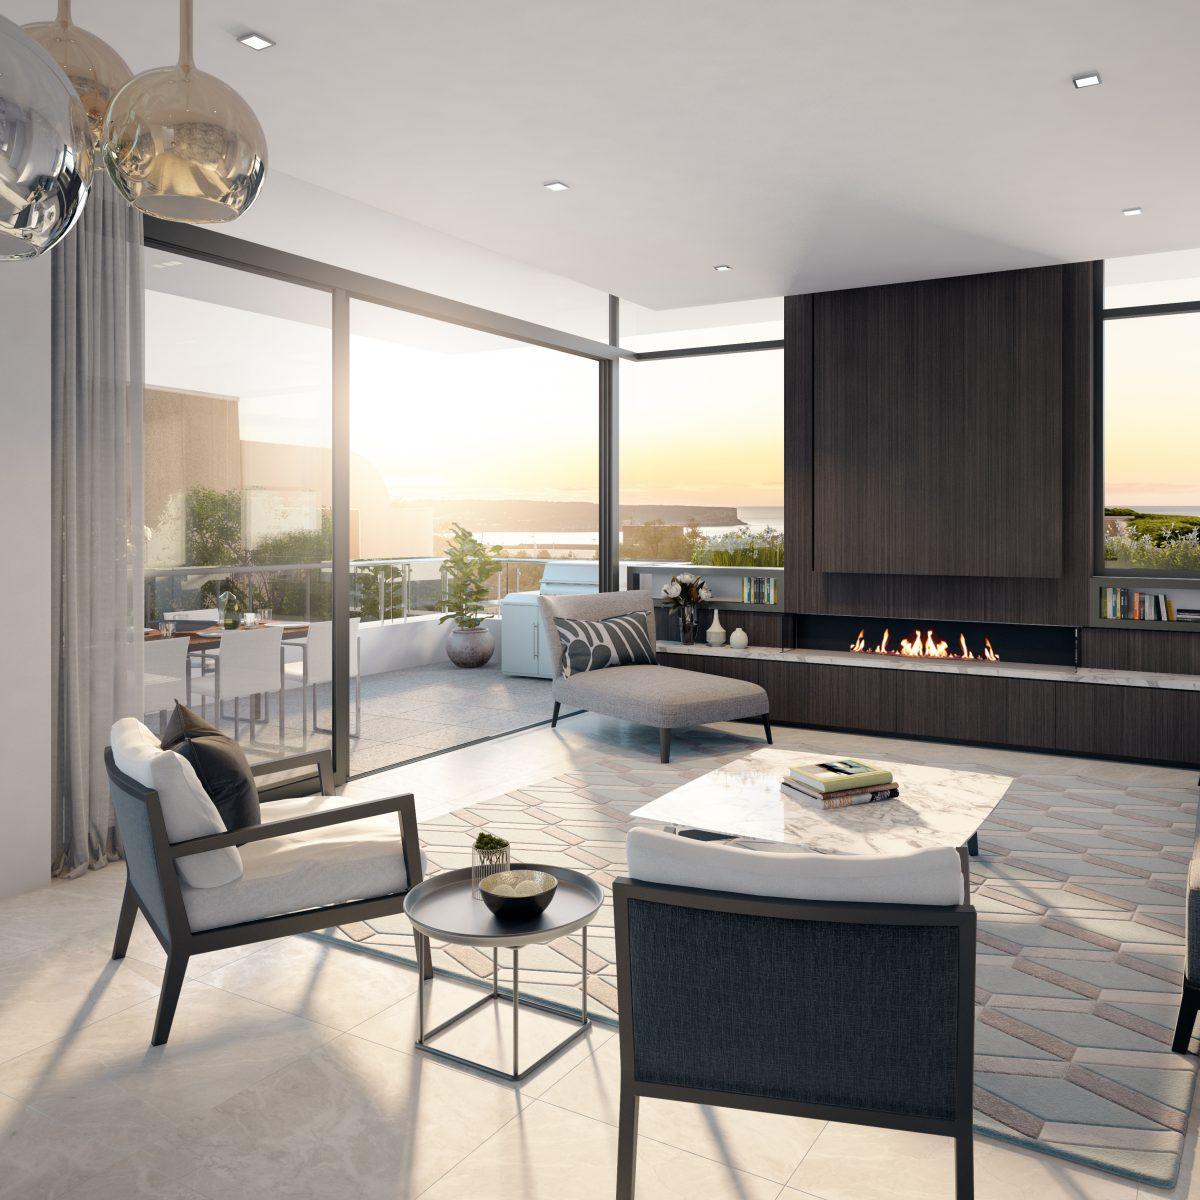 EVA MOSMAN – Limited edition luxury residences – The Property Addict